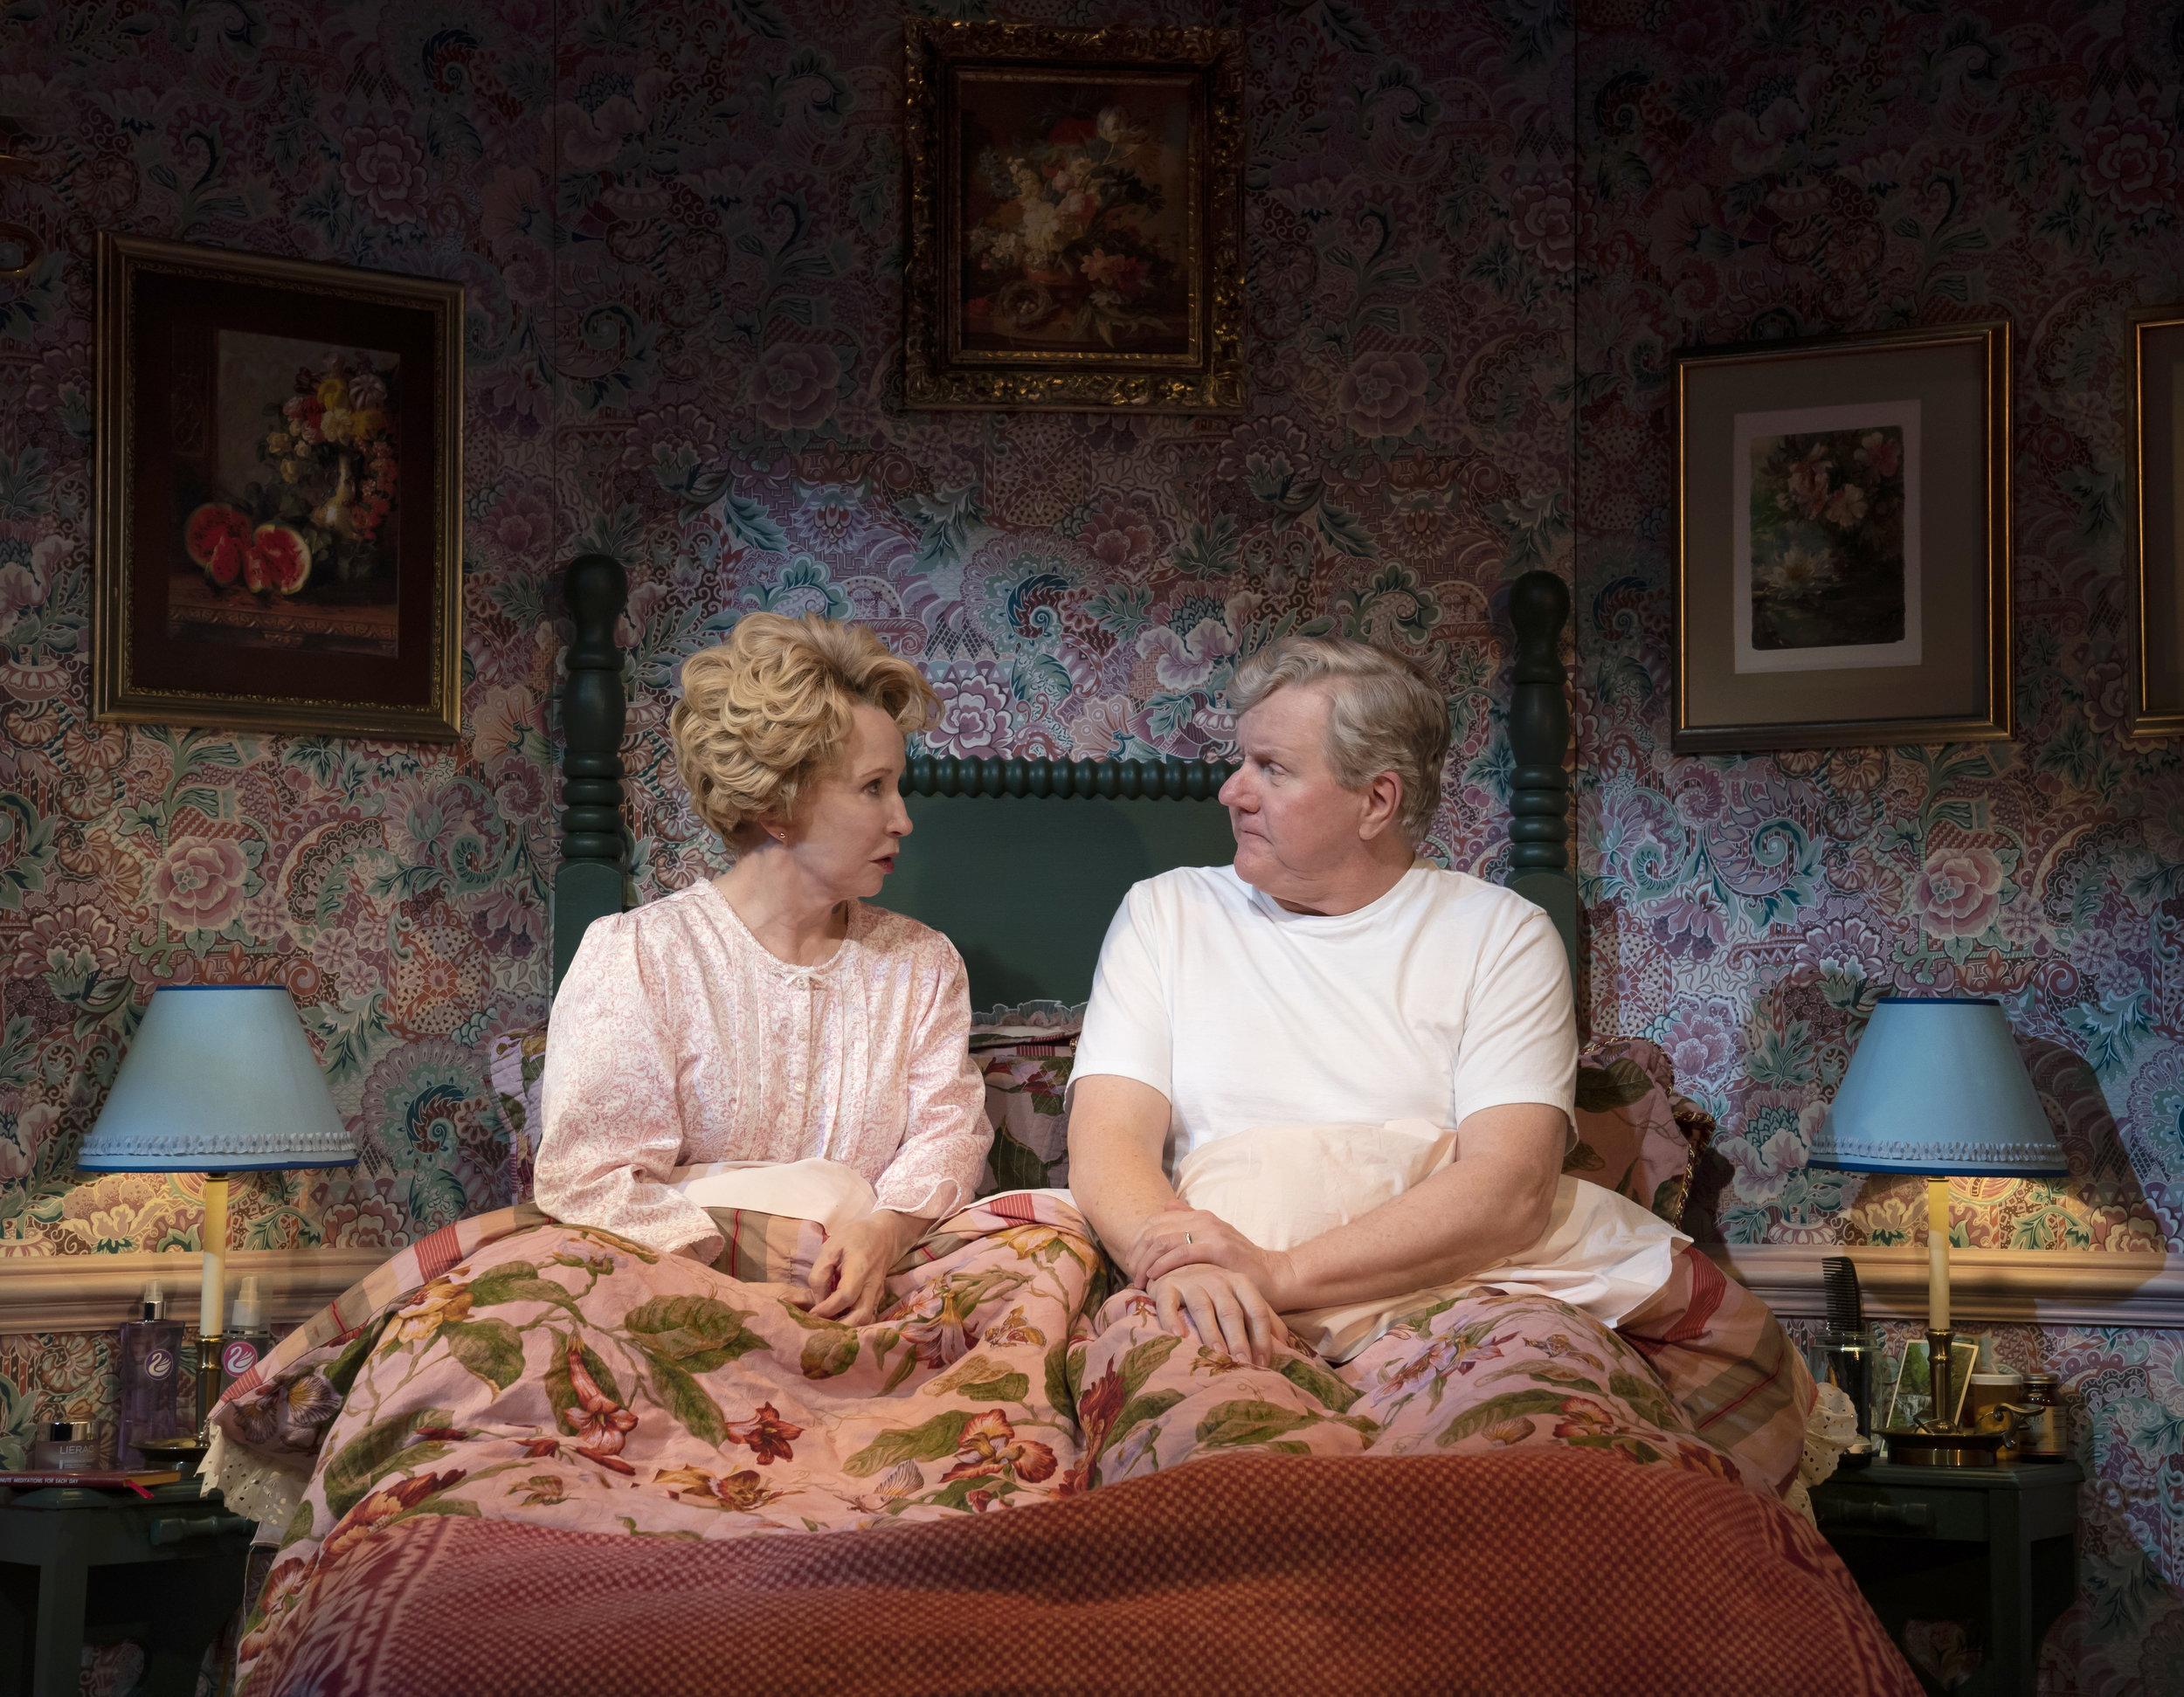 Debra Jo Rupp and Dan Daily. Photo Credit: Joan Marcus.